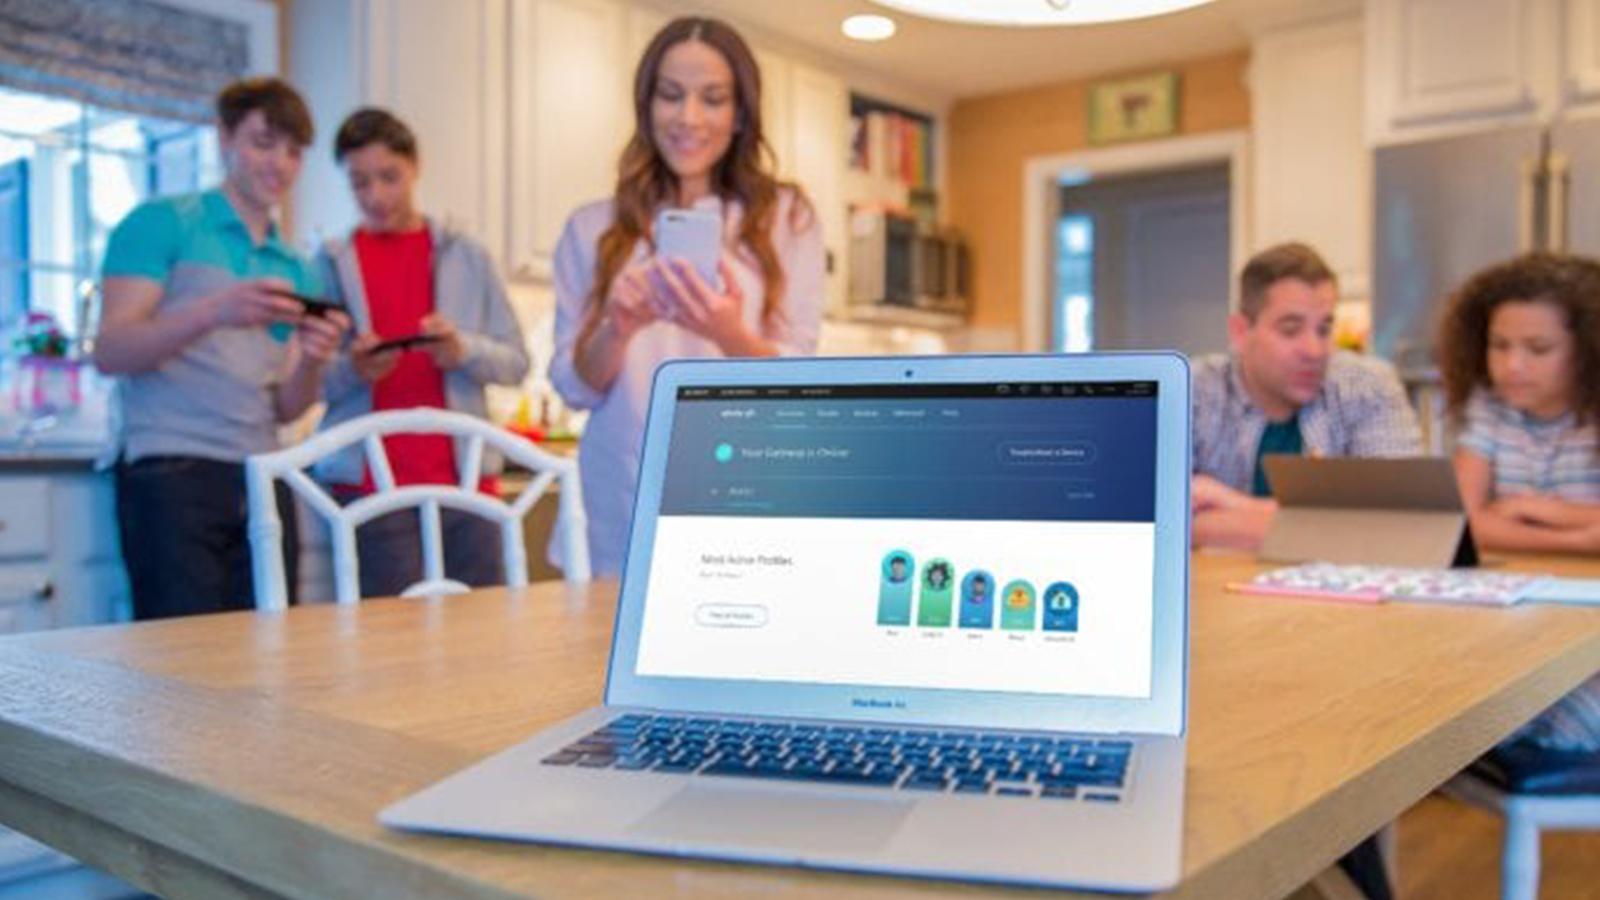 A laptop displays the Xfinity xFi app.